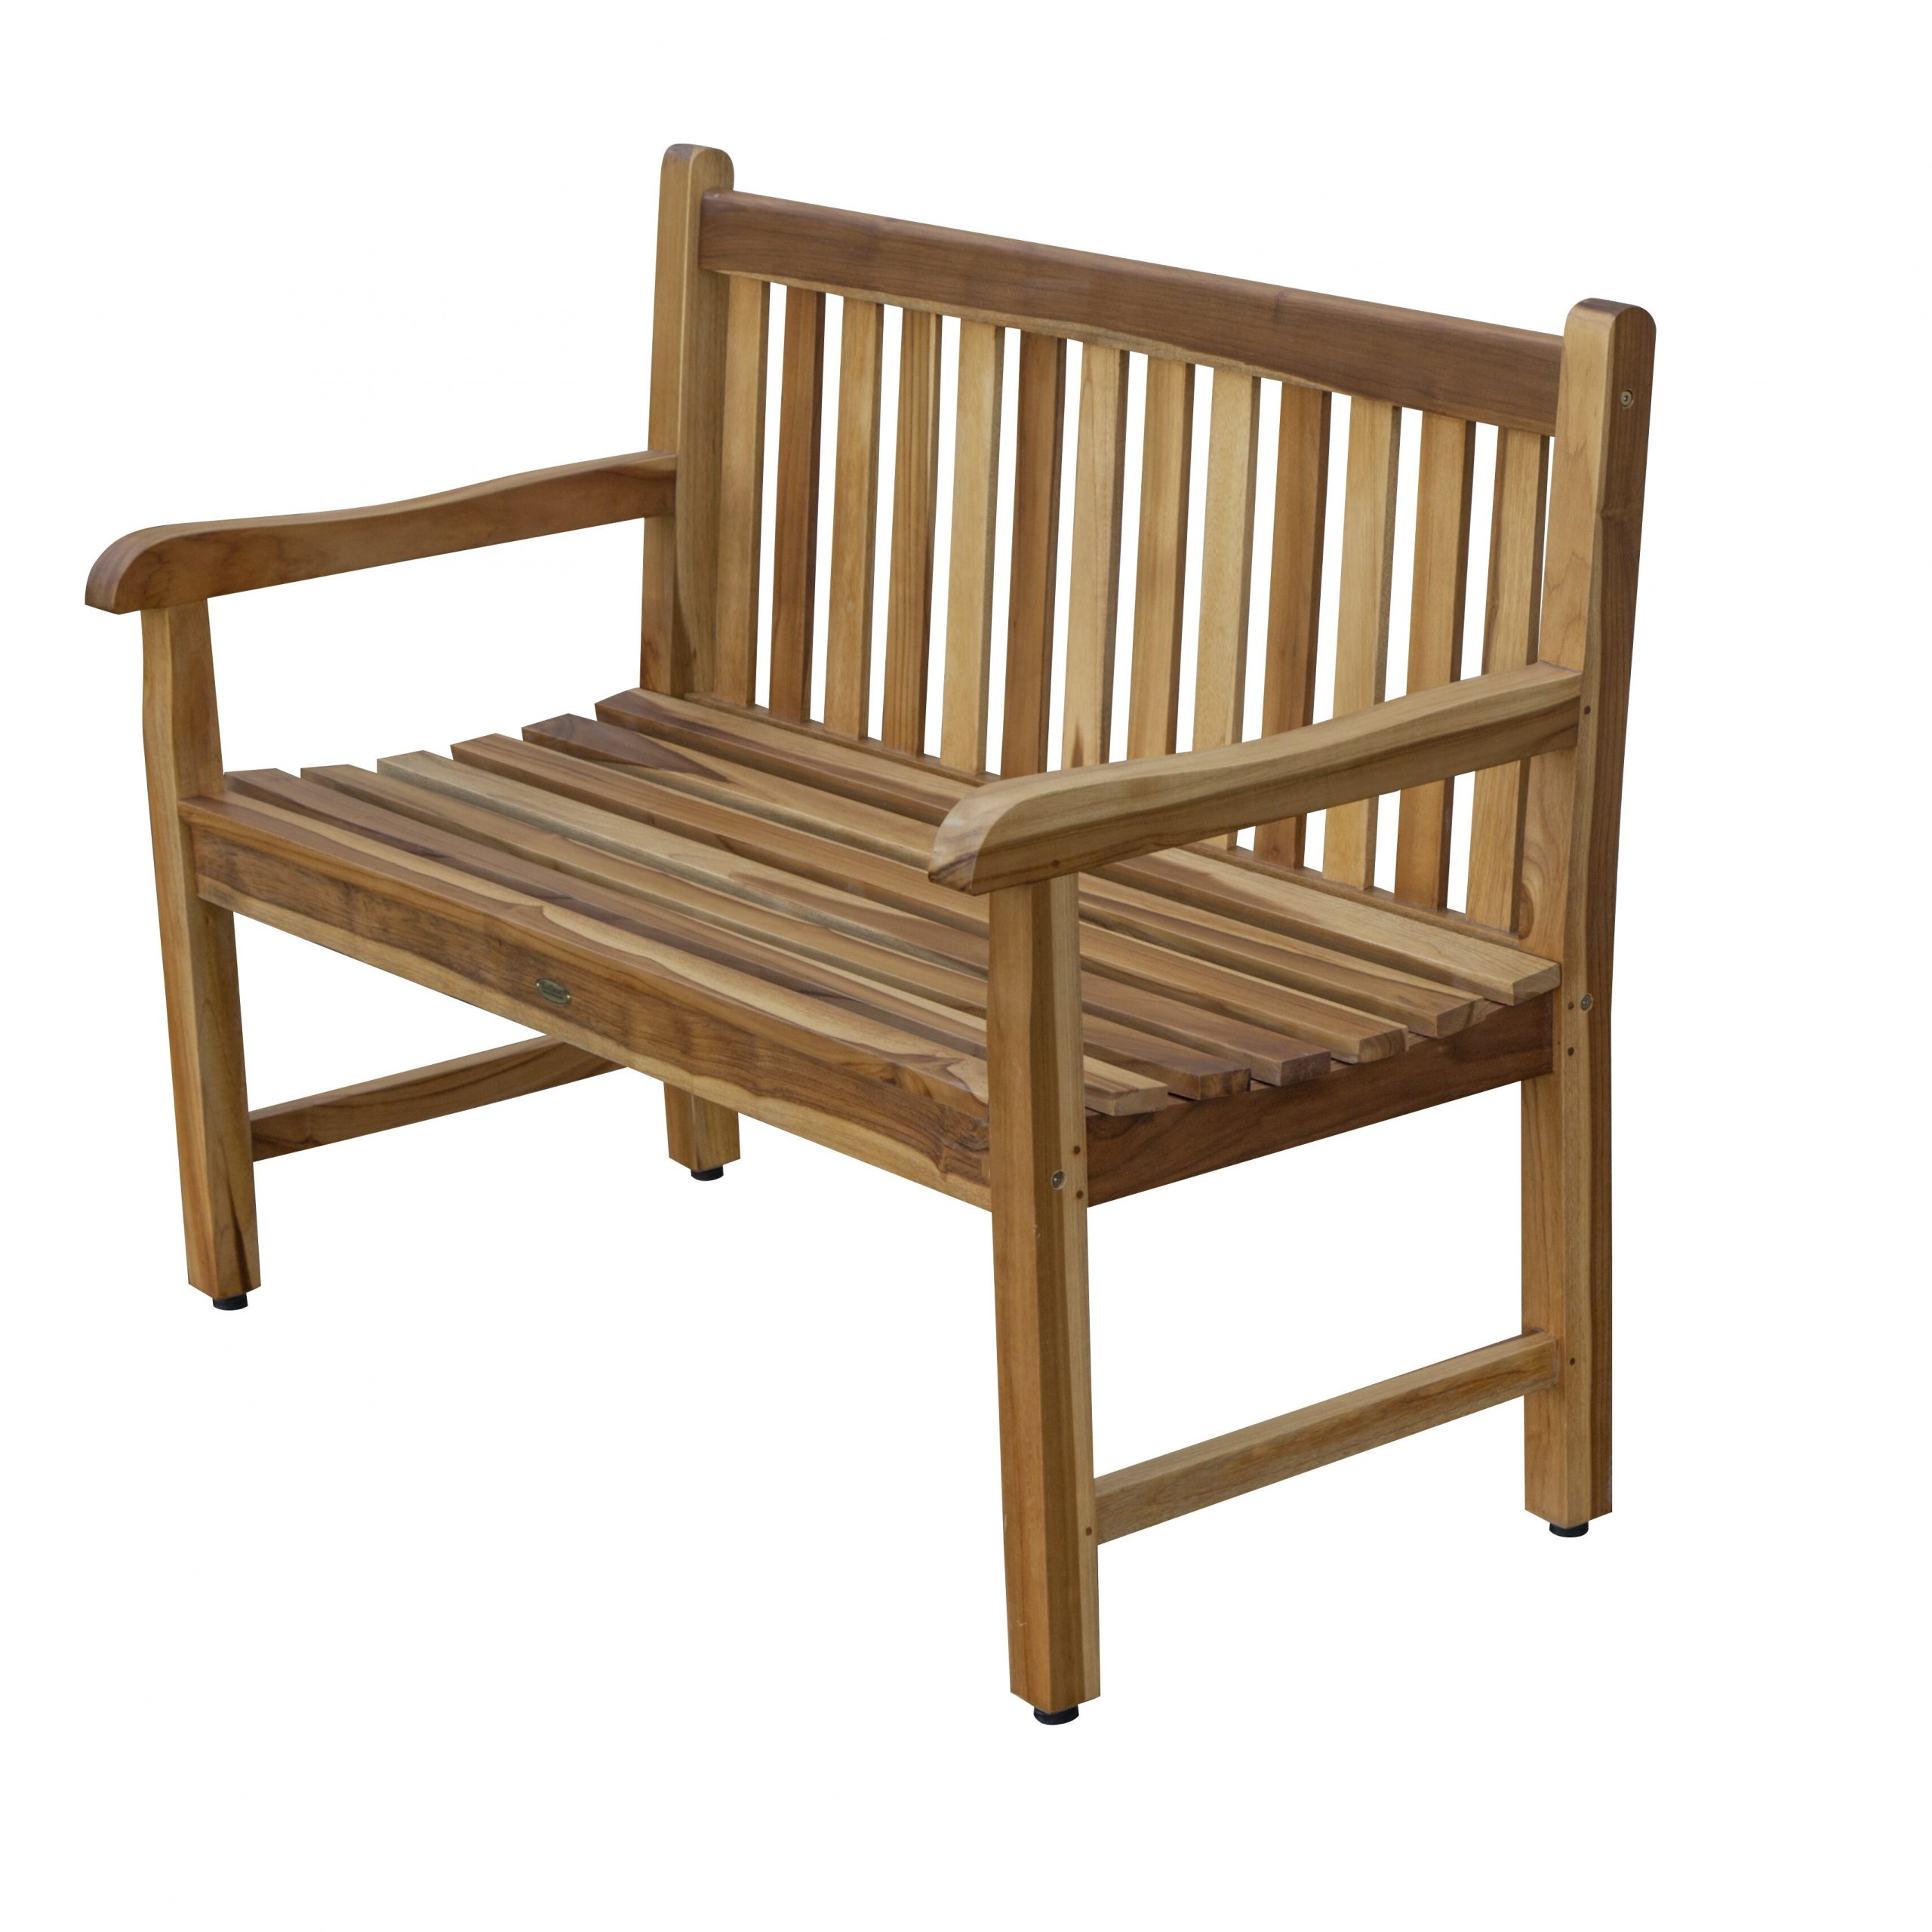 Hampstead Heath Teak Garden Bench Pertaining To Harpersfield Wooden Garden Benches (View 7 of 25)